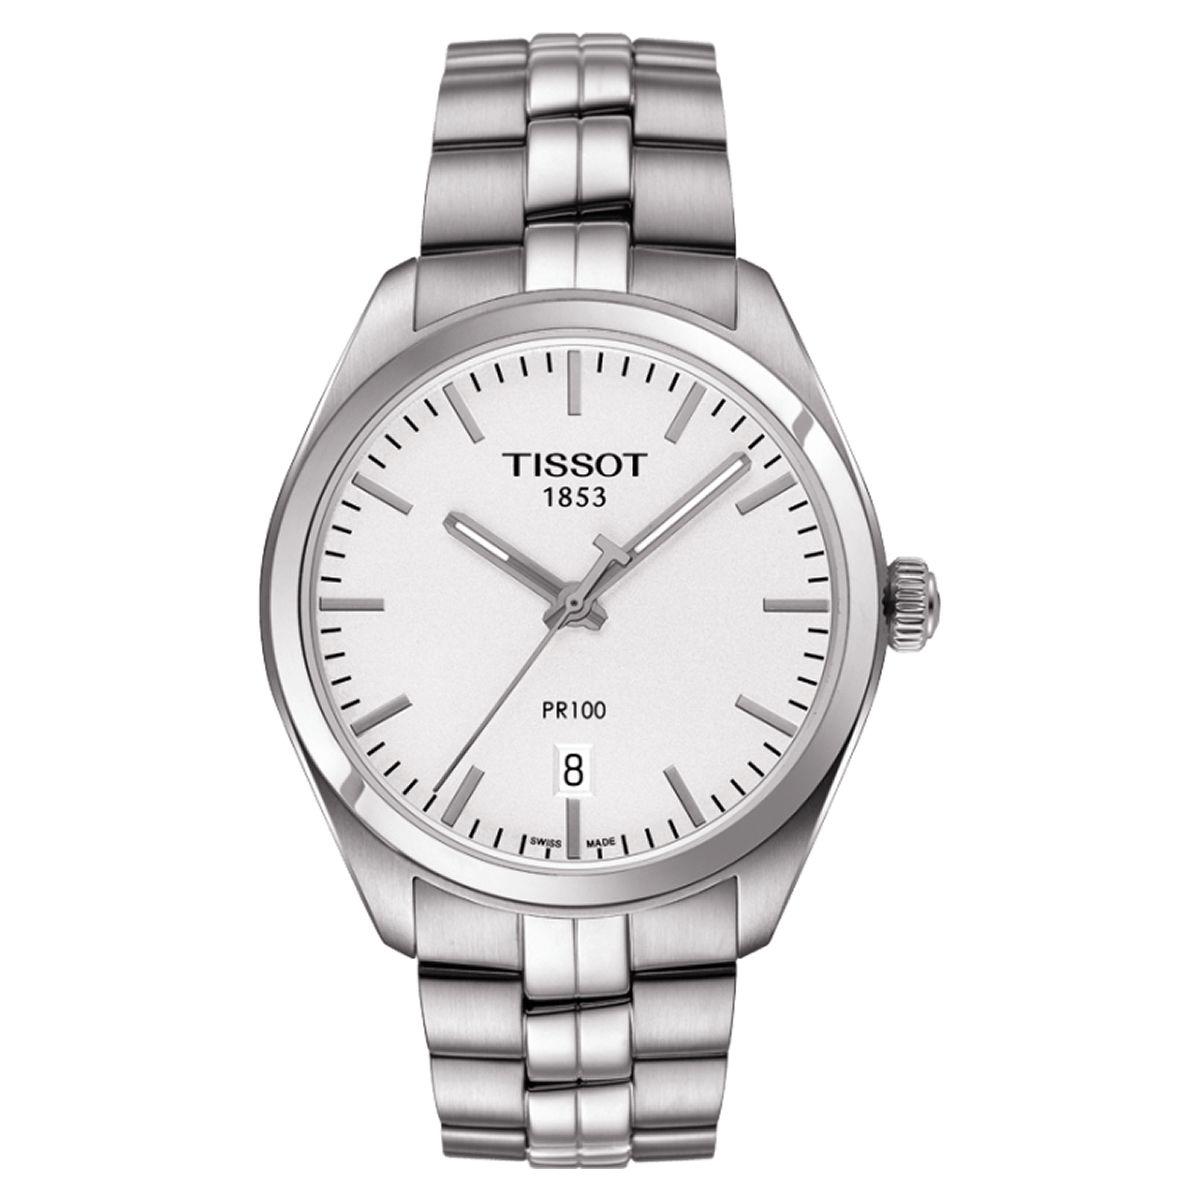 TISSOT(ティソ) PR100  クォーツ メンズ T101.410.11.031.00 腕時計